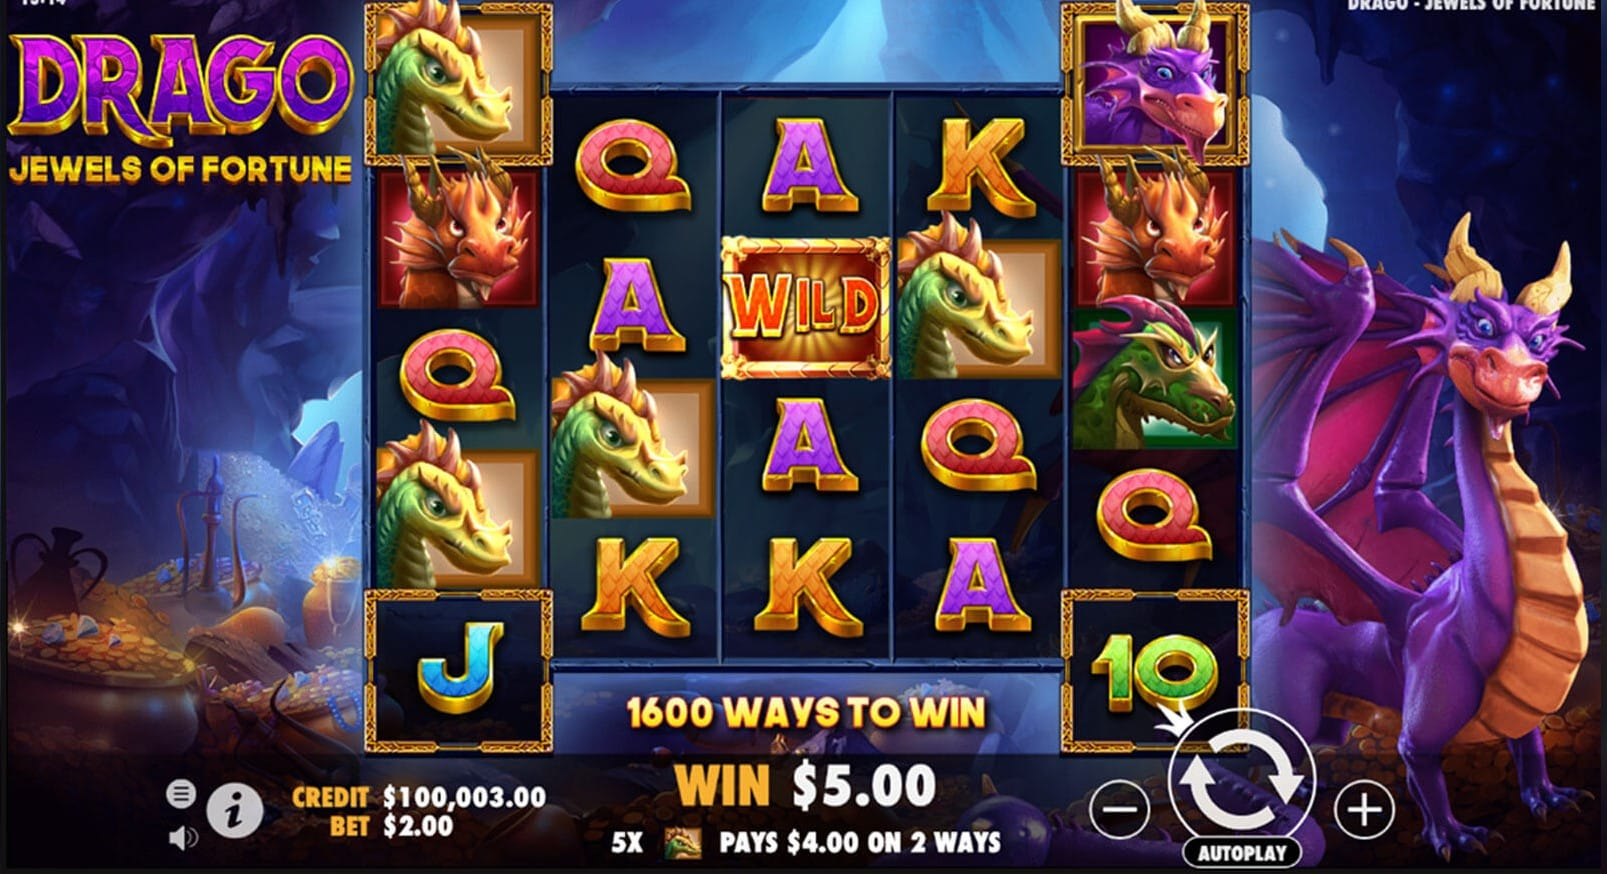 Drago Jewels of Fortune Slots UK